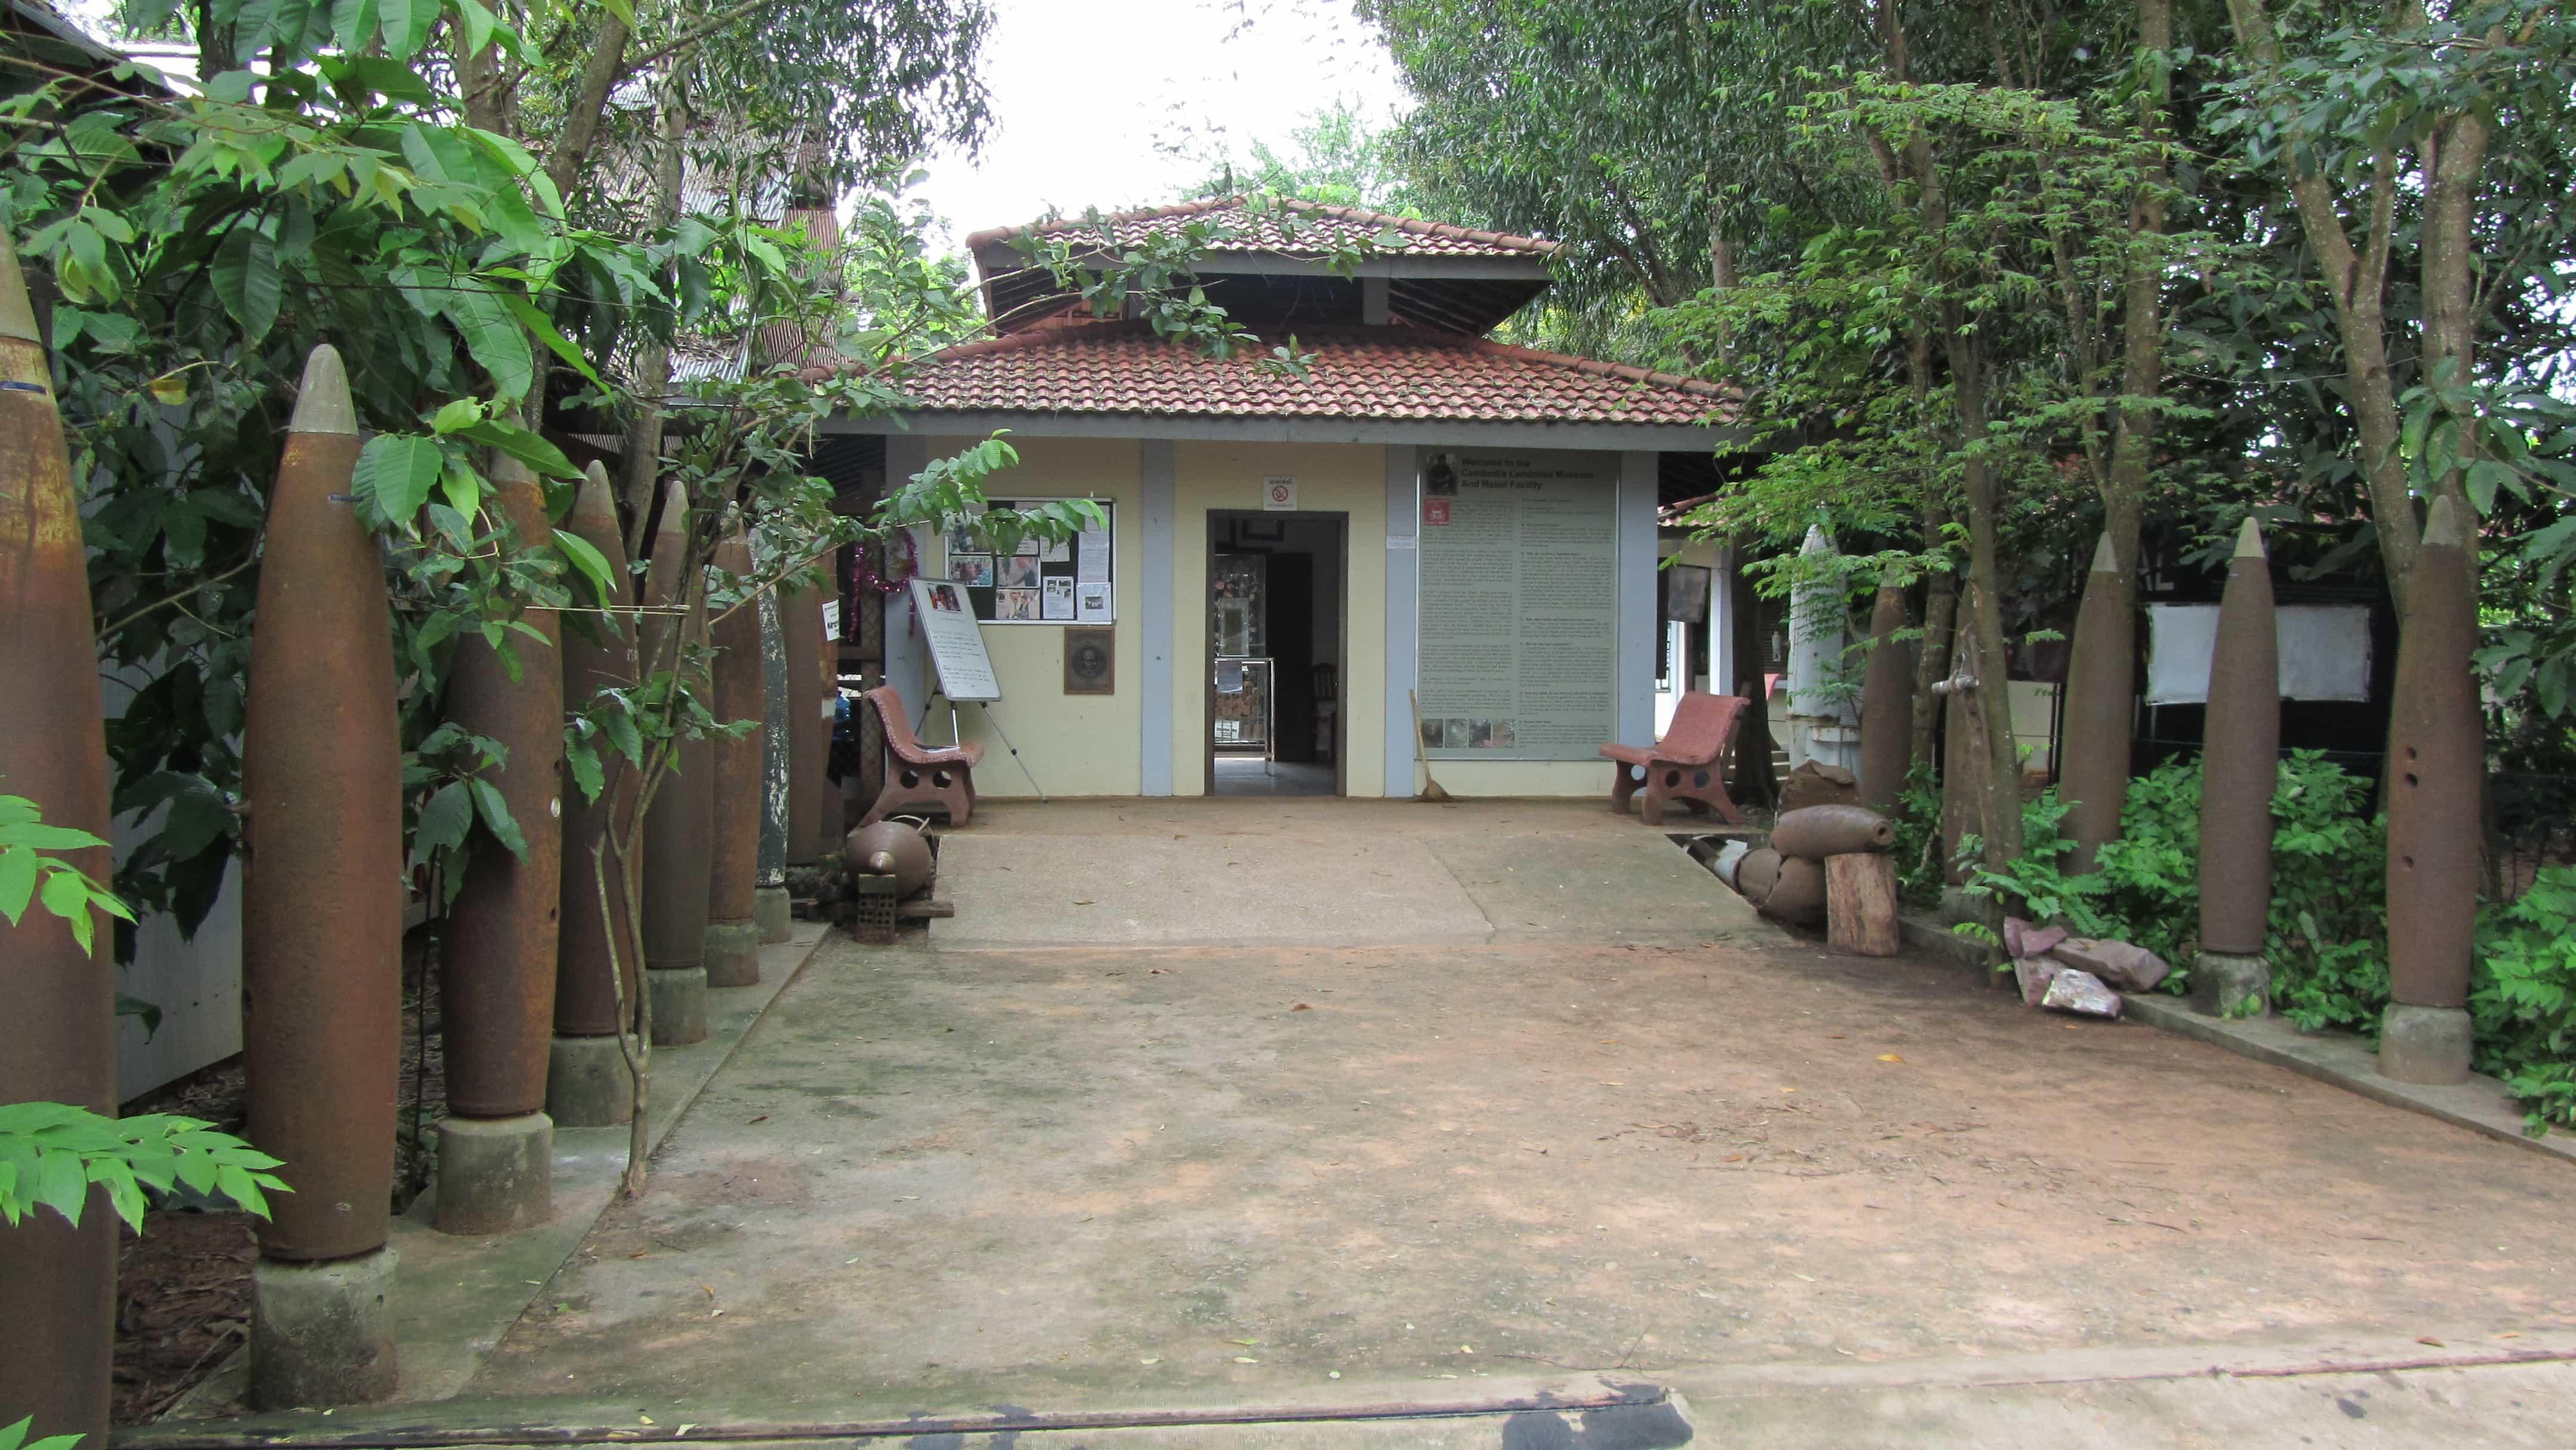 Cambodia Tourist Spots, Cambodia Landmine Museum